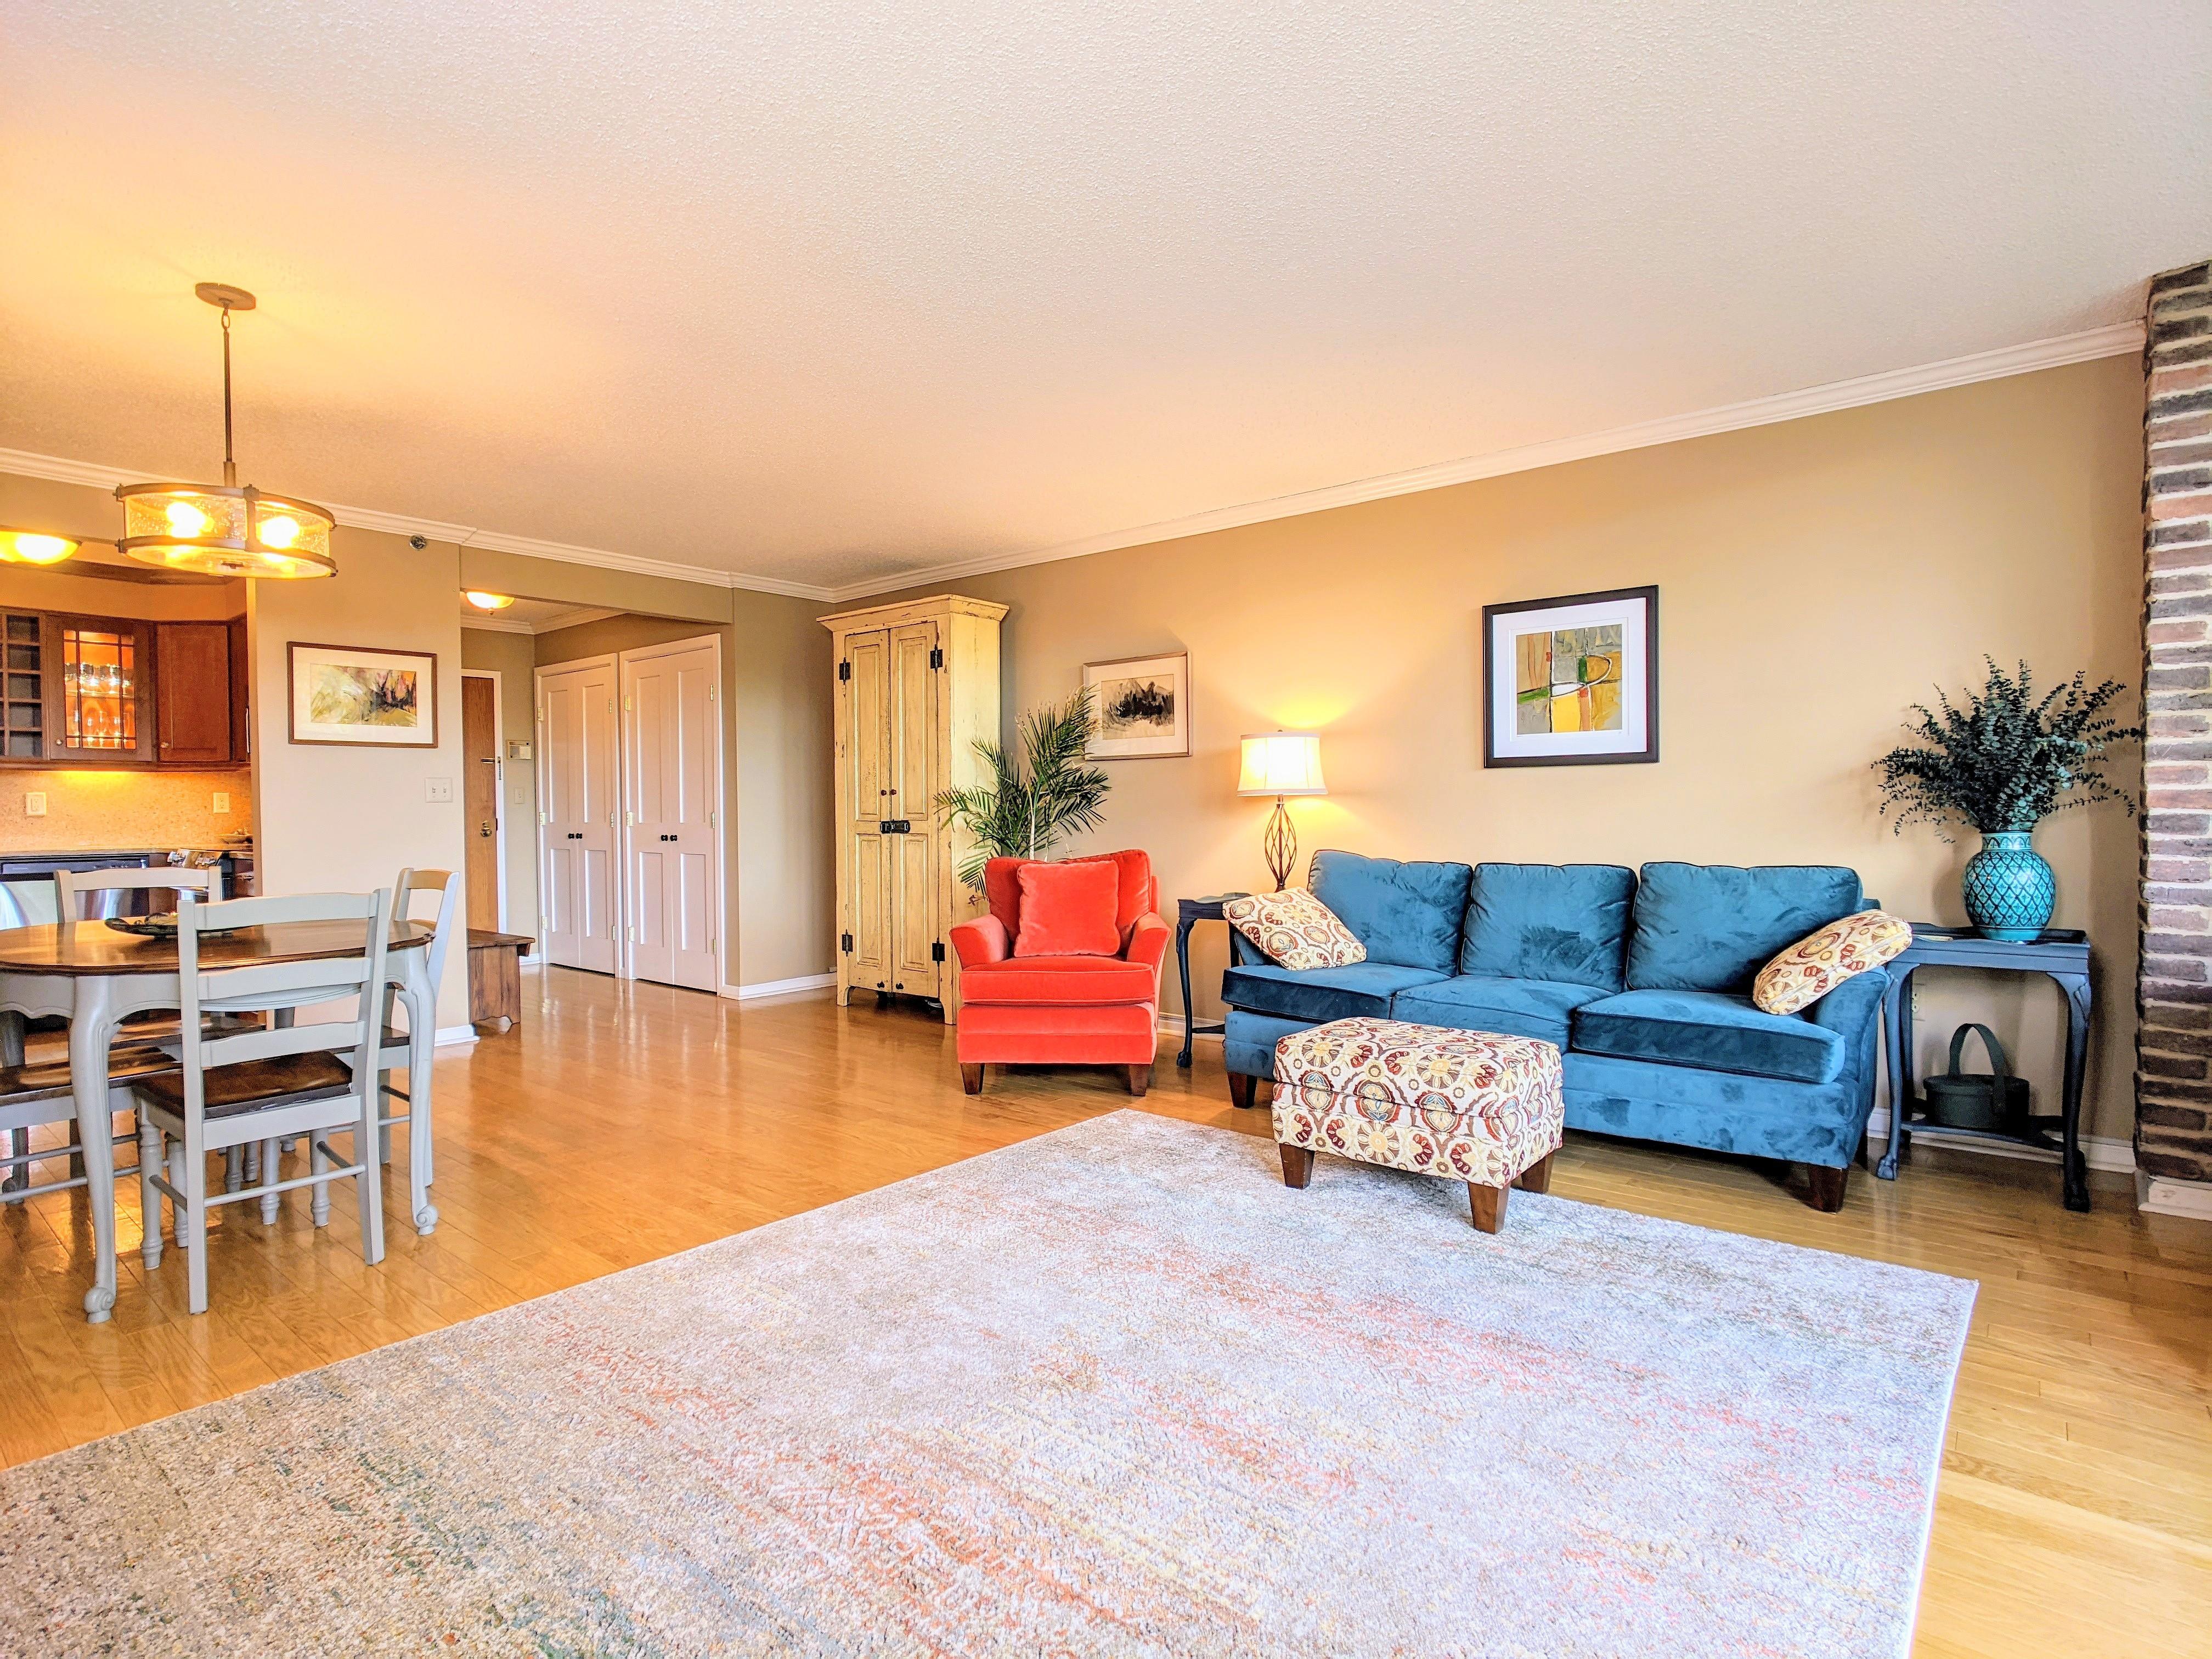 2 Bedrooms / 2 Bathrooms - Est. $2,234.00 / Month* for rent in Little Falls, NJ